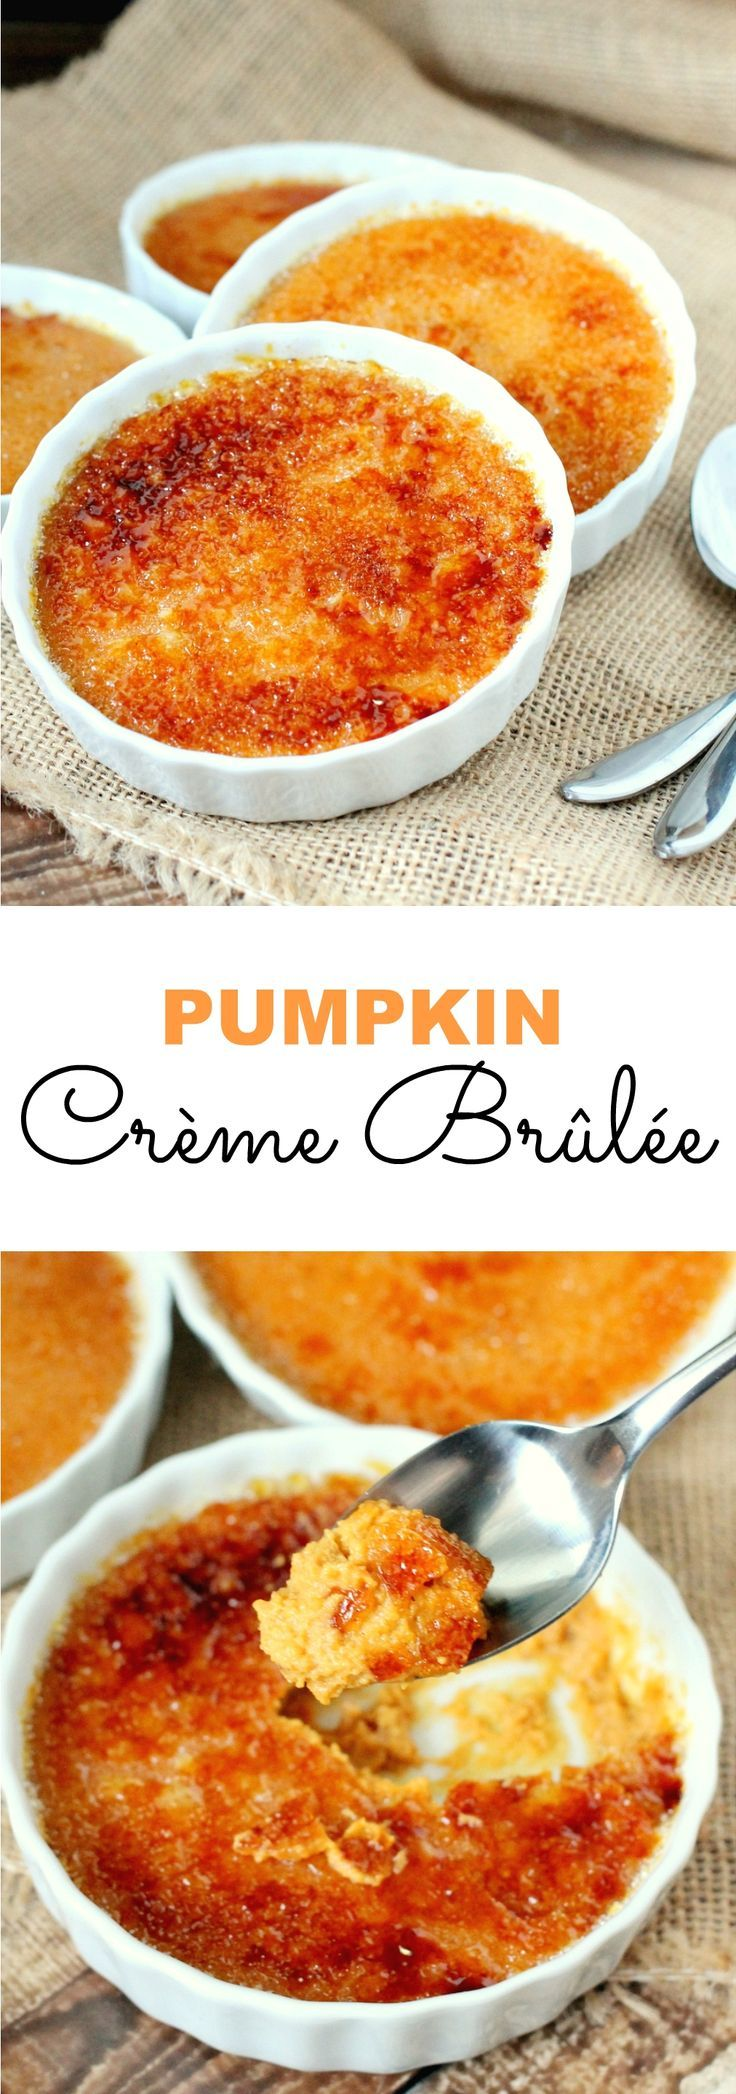 Pumpkin Creme brulee simple recipe